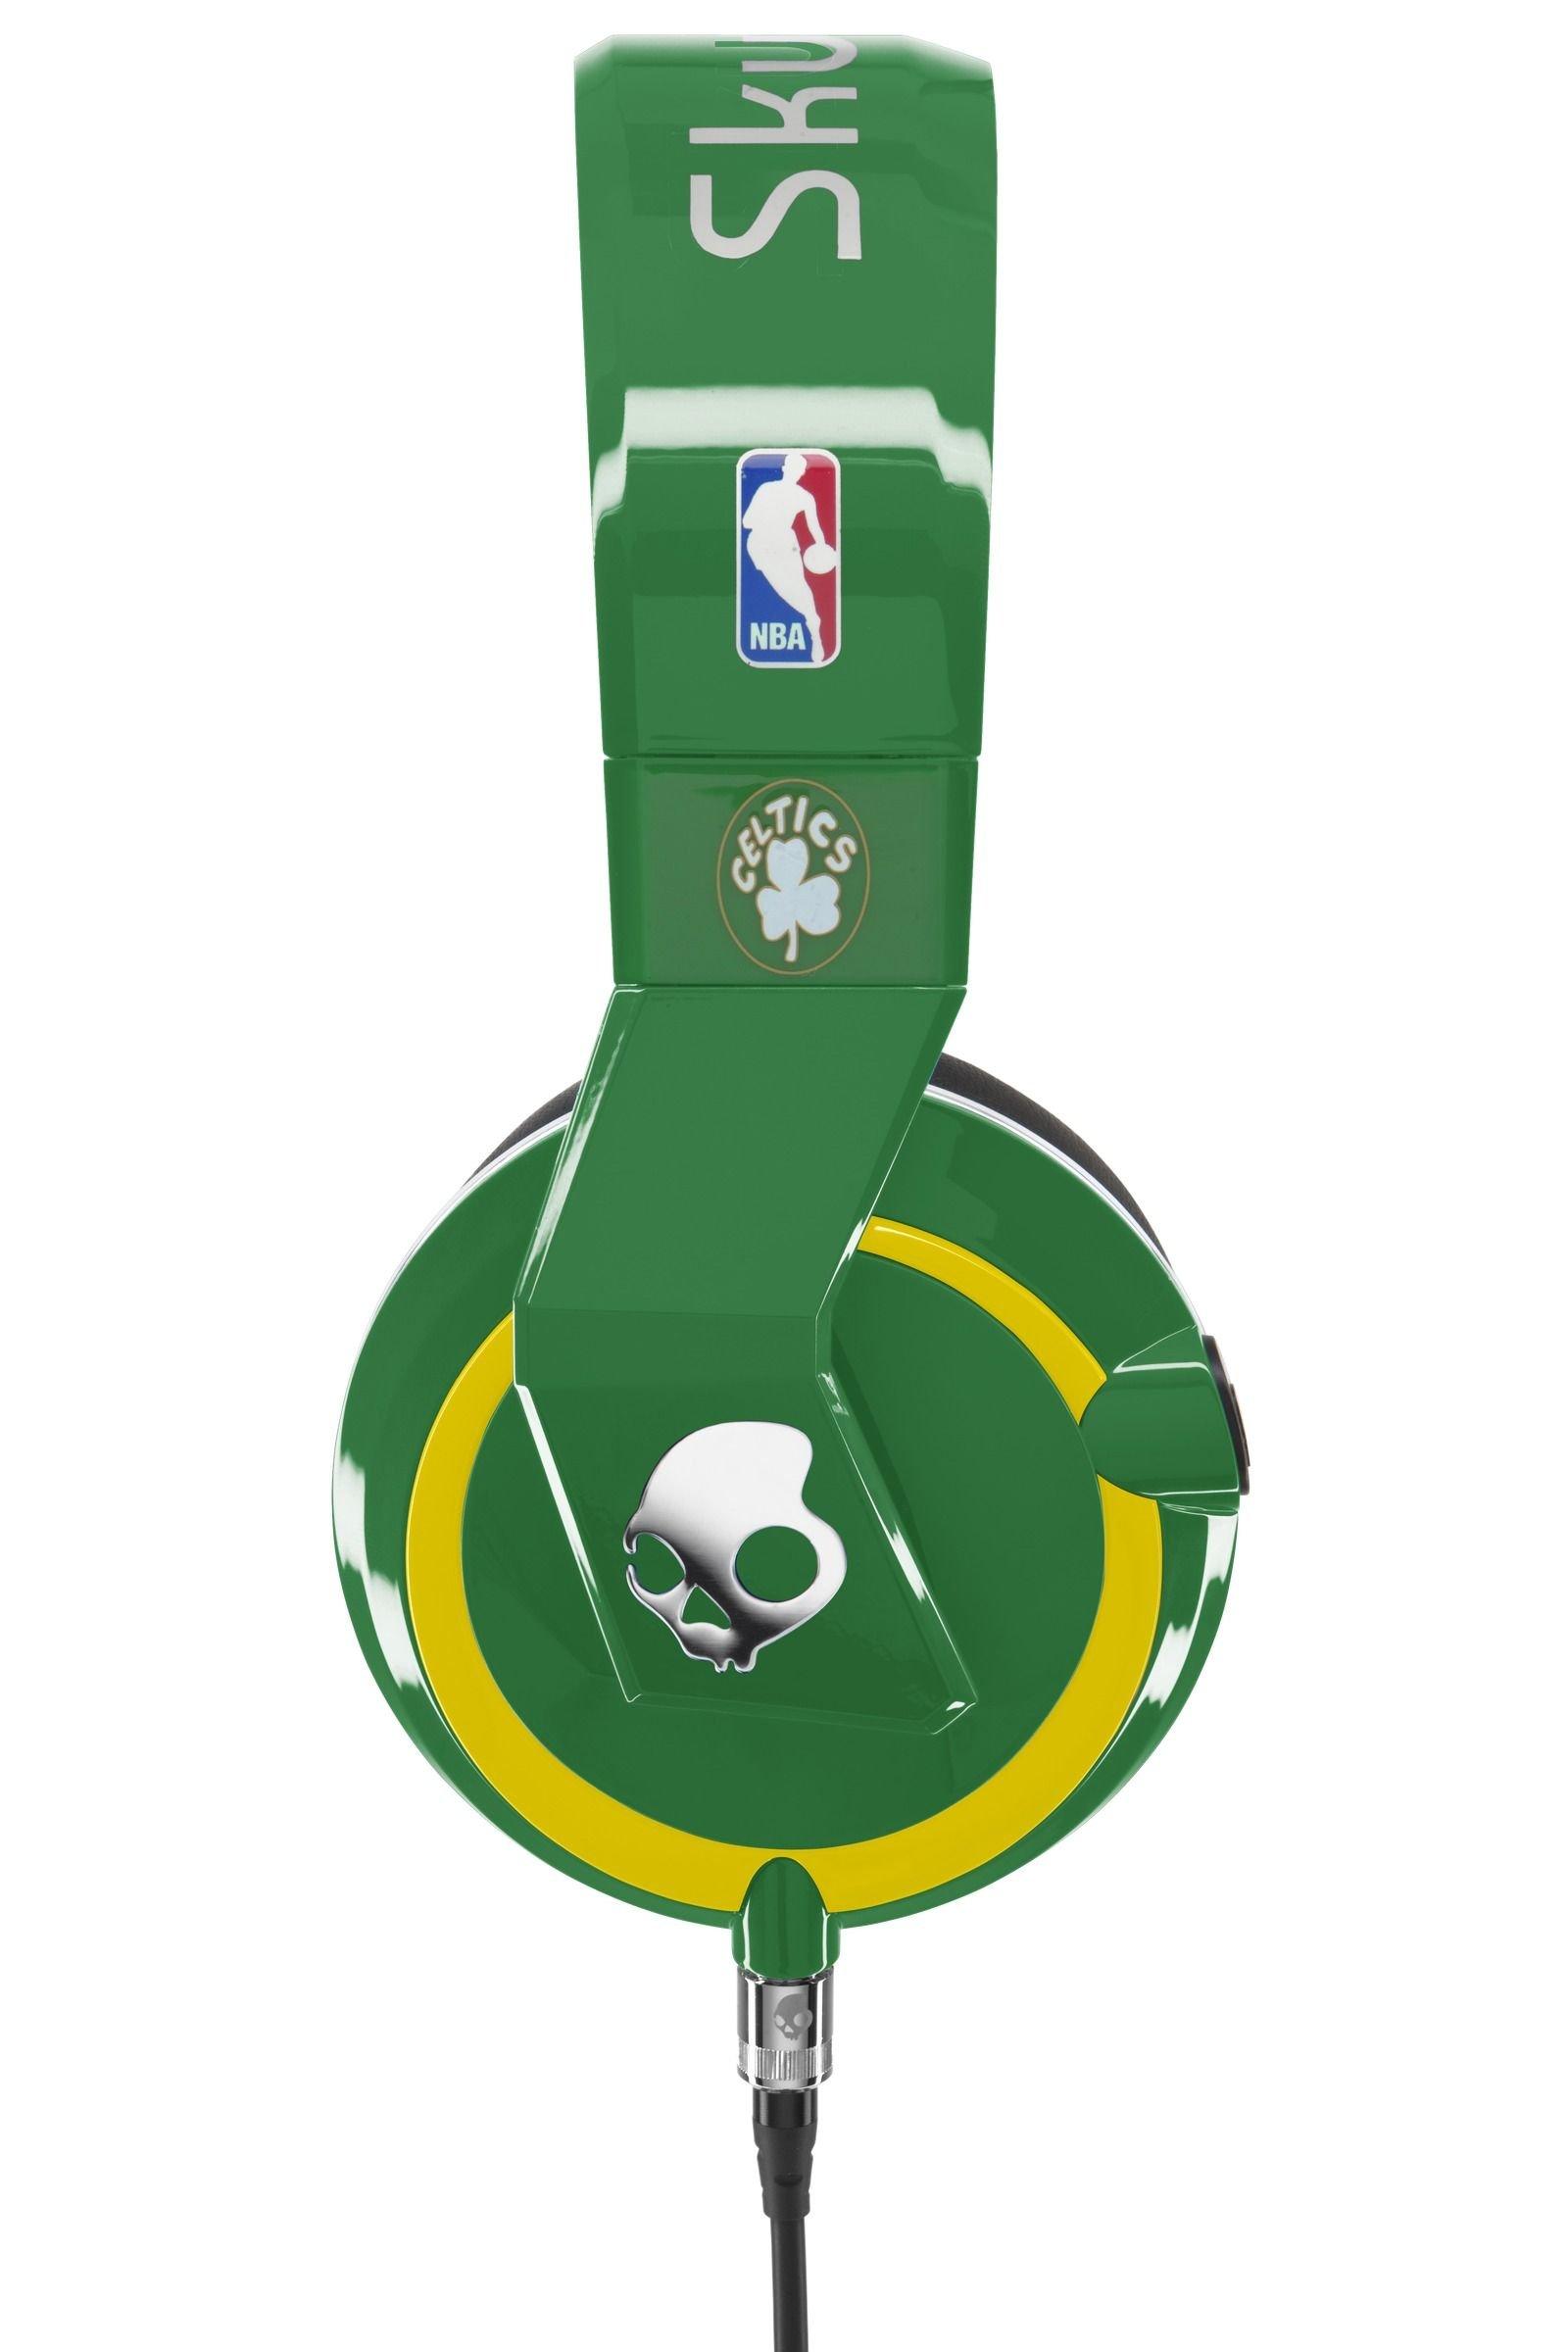 Skullcandy Mix Master Headphones with DJ Capabilities and 3 Button Mic, NBA Boston Celtics by Skullcandy (Image #3)